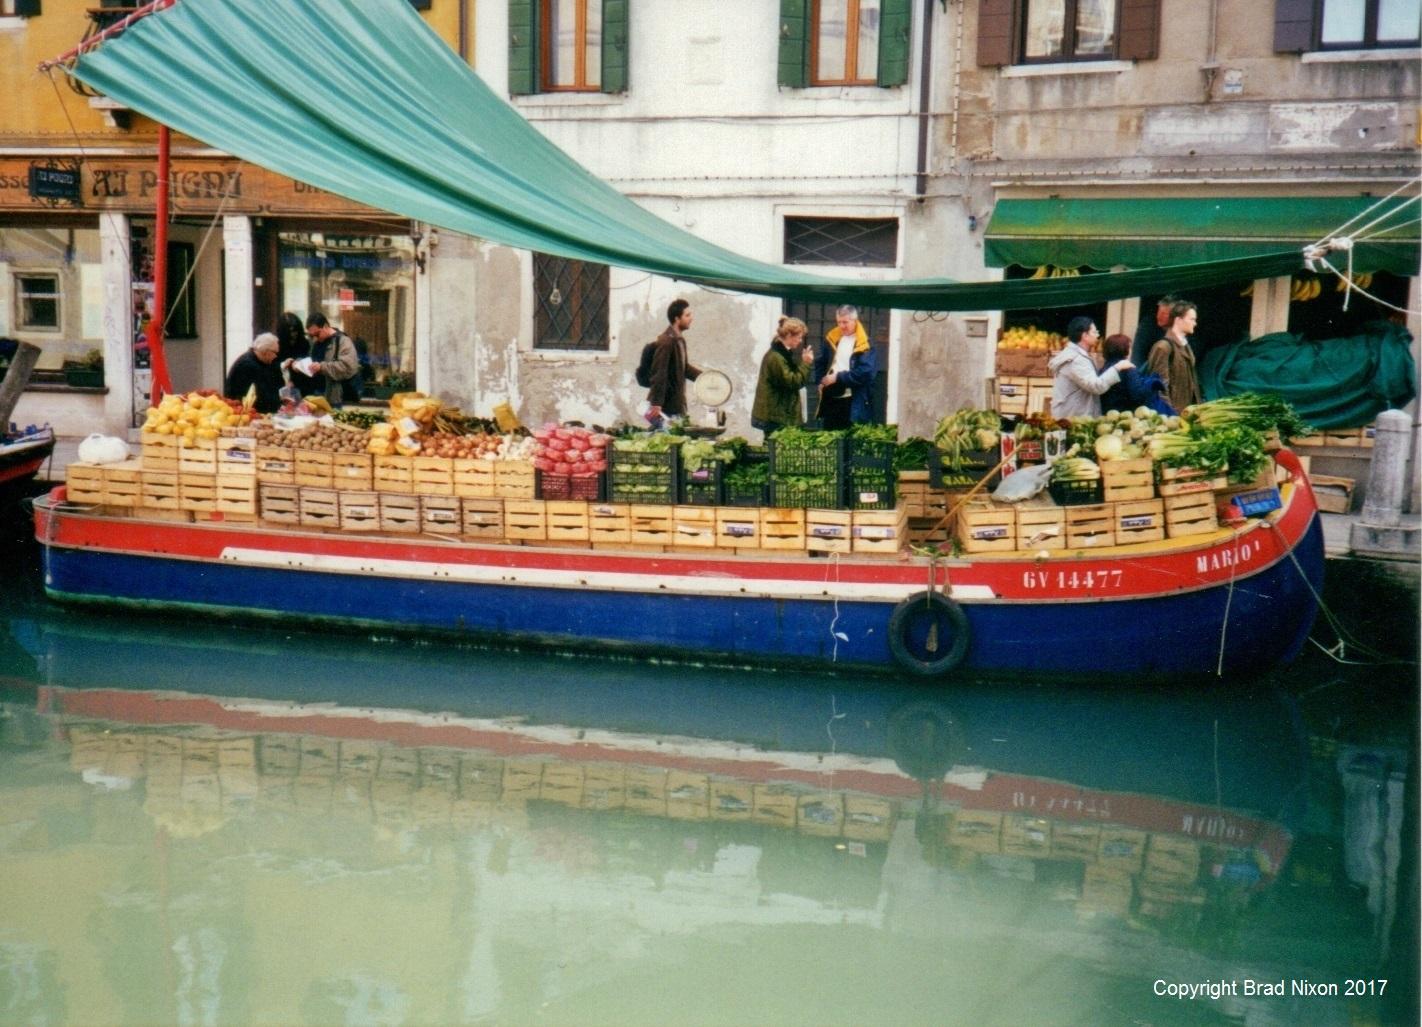 Venice: Boat Building, Bridge Fights and a Boat Legend